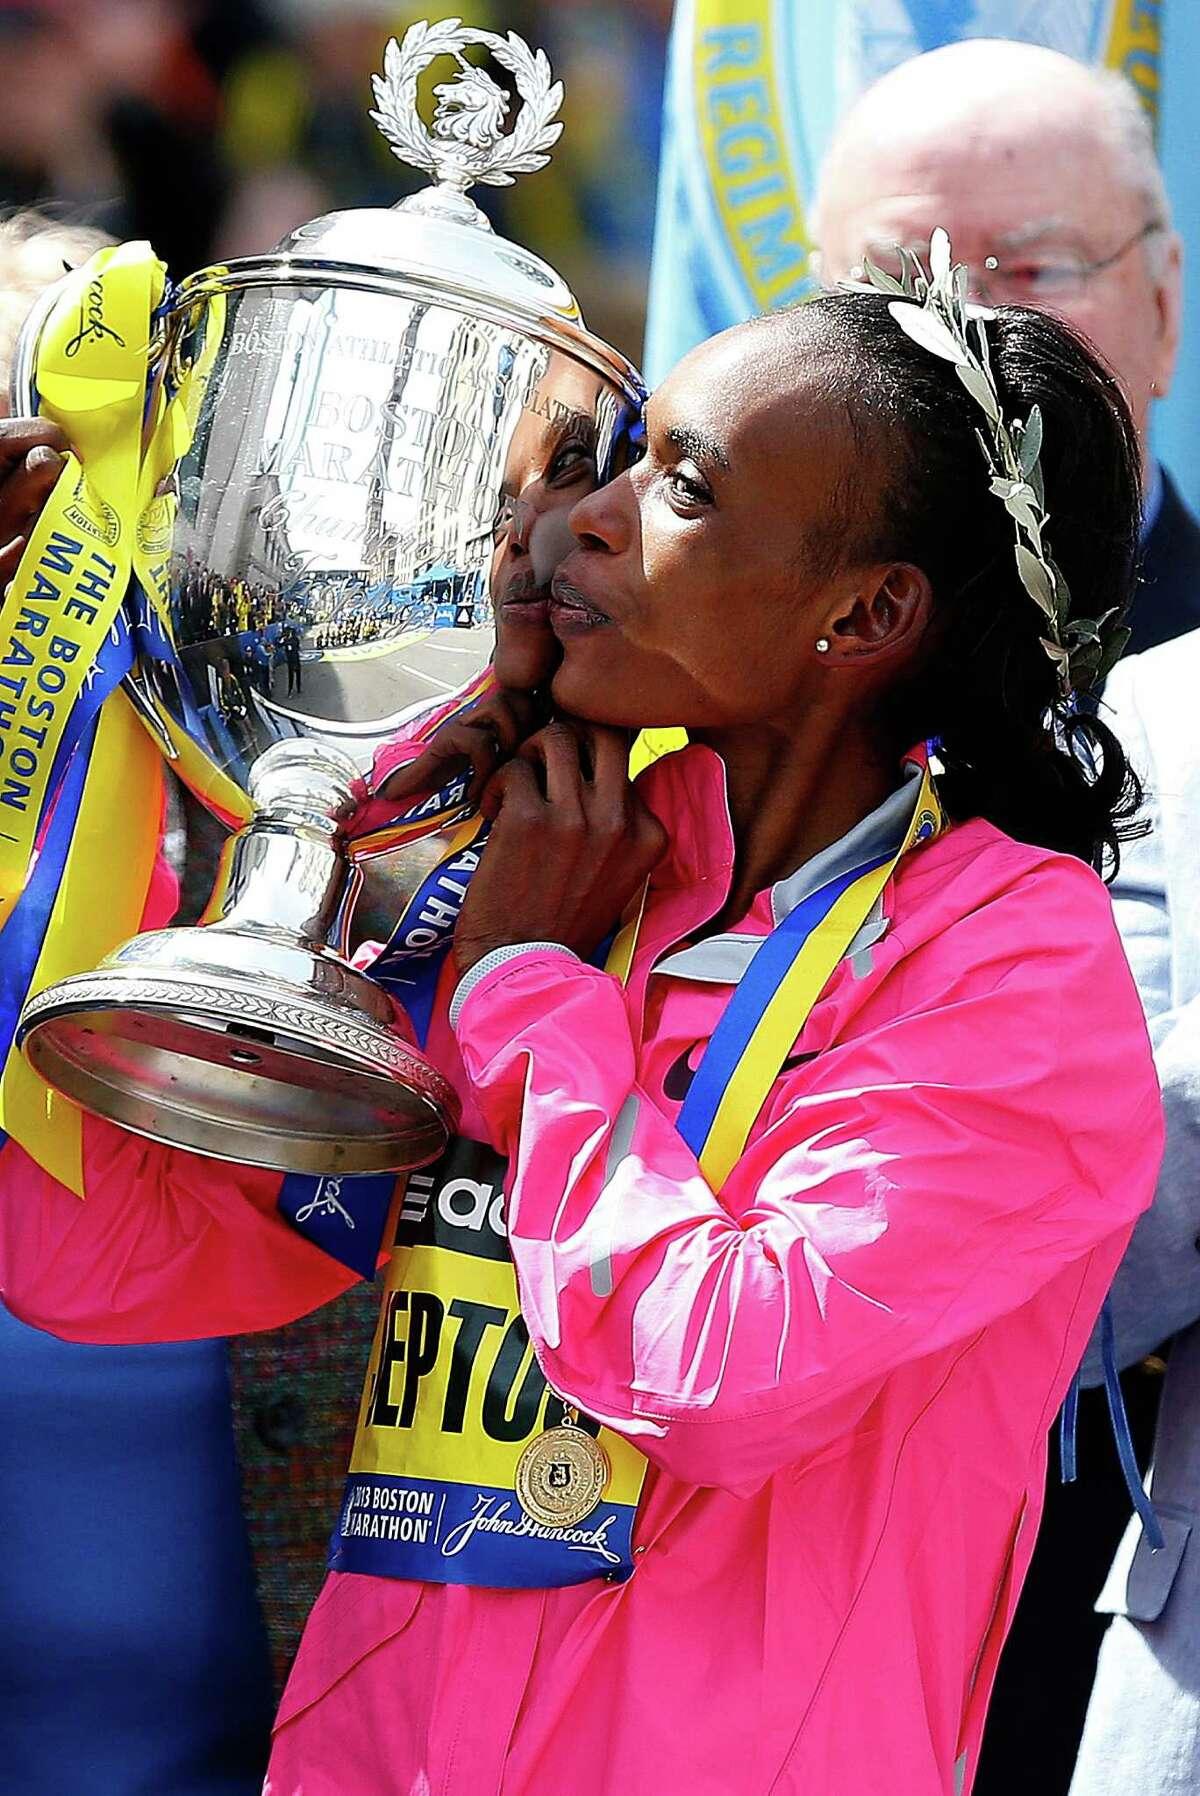 BOSTON, MA - APRIL 15: Rita Jeptoo of Kenya kisses the trophy after winning the women?s division of the 117th Boston Marathon on April 15, 2013 in Boston, Massachusetts.